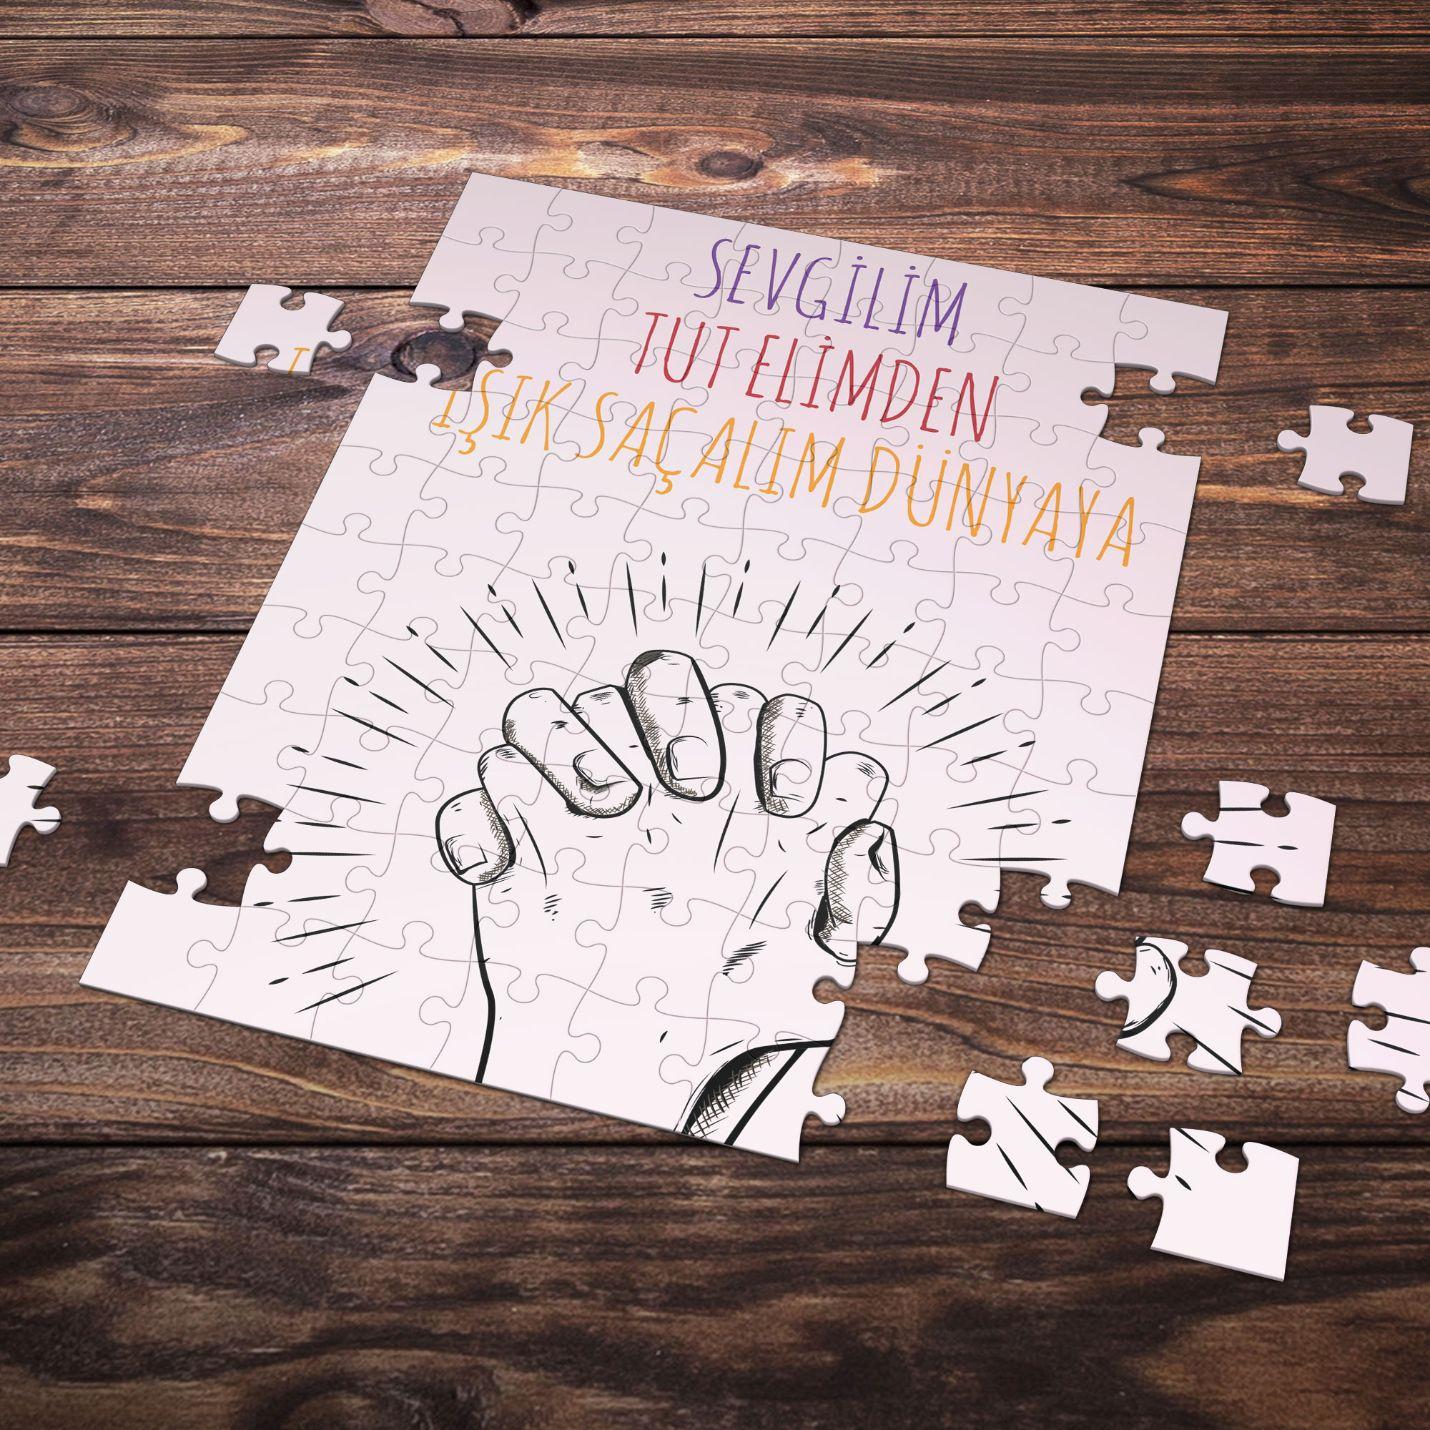 99 Parça Romantik Tasarımlı Puzzle Yapboz No23